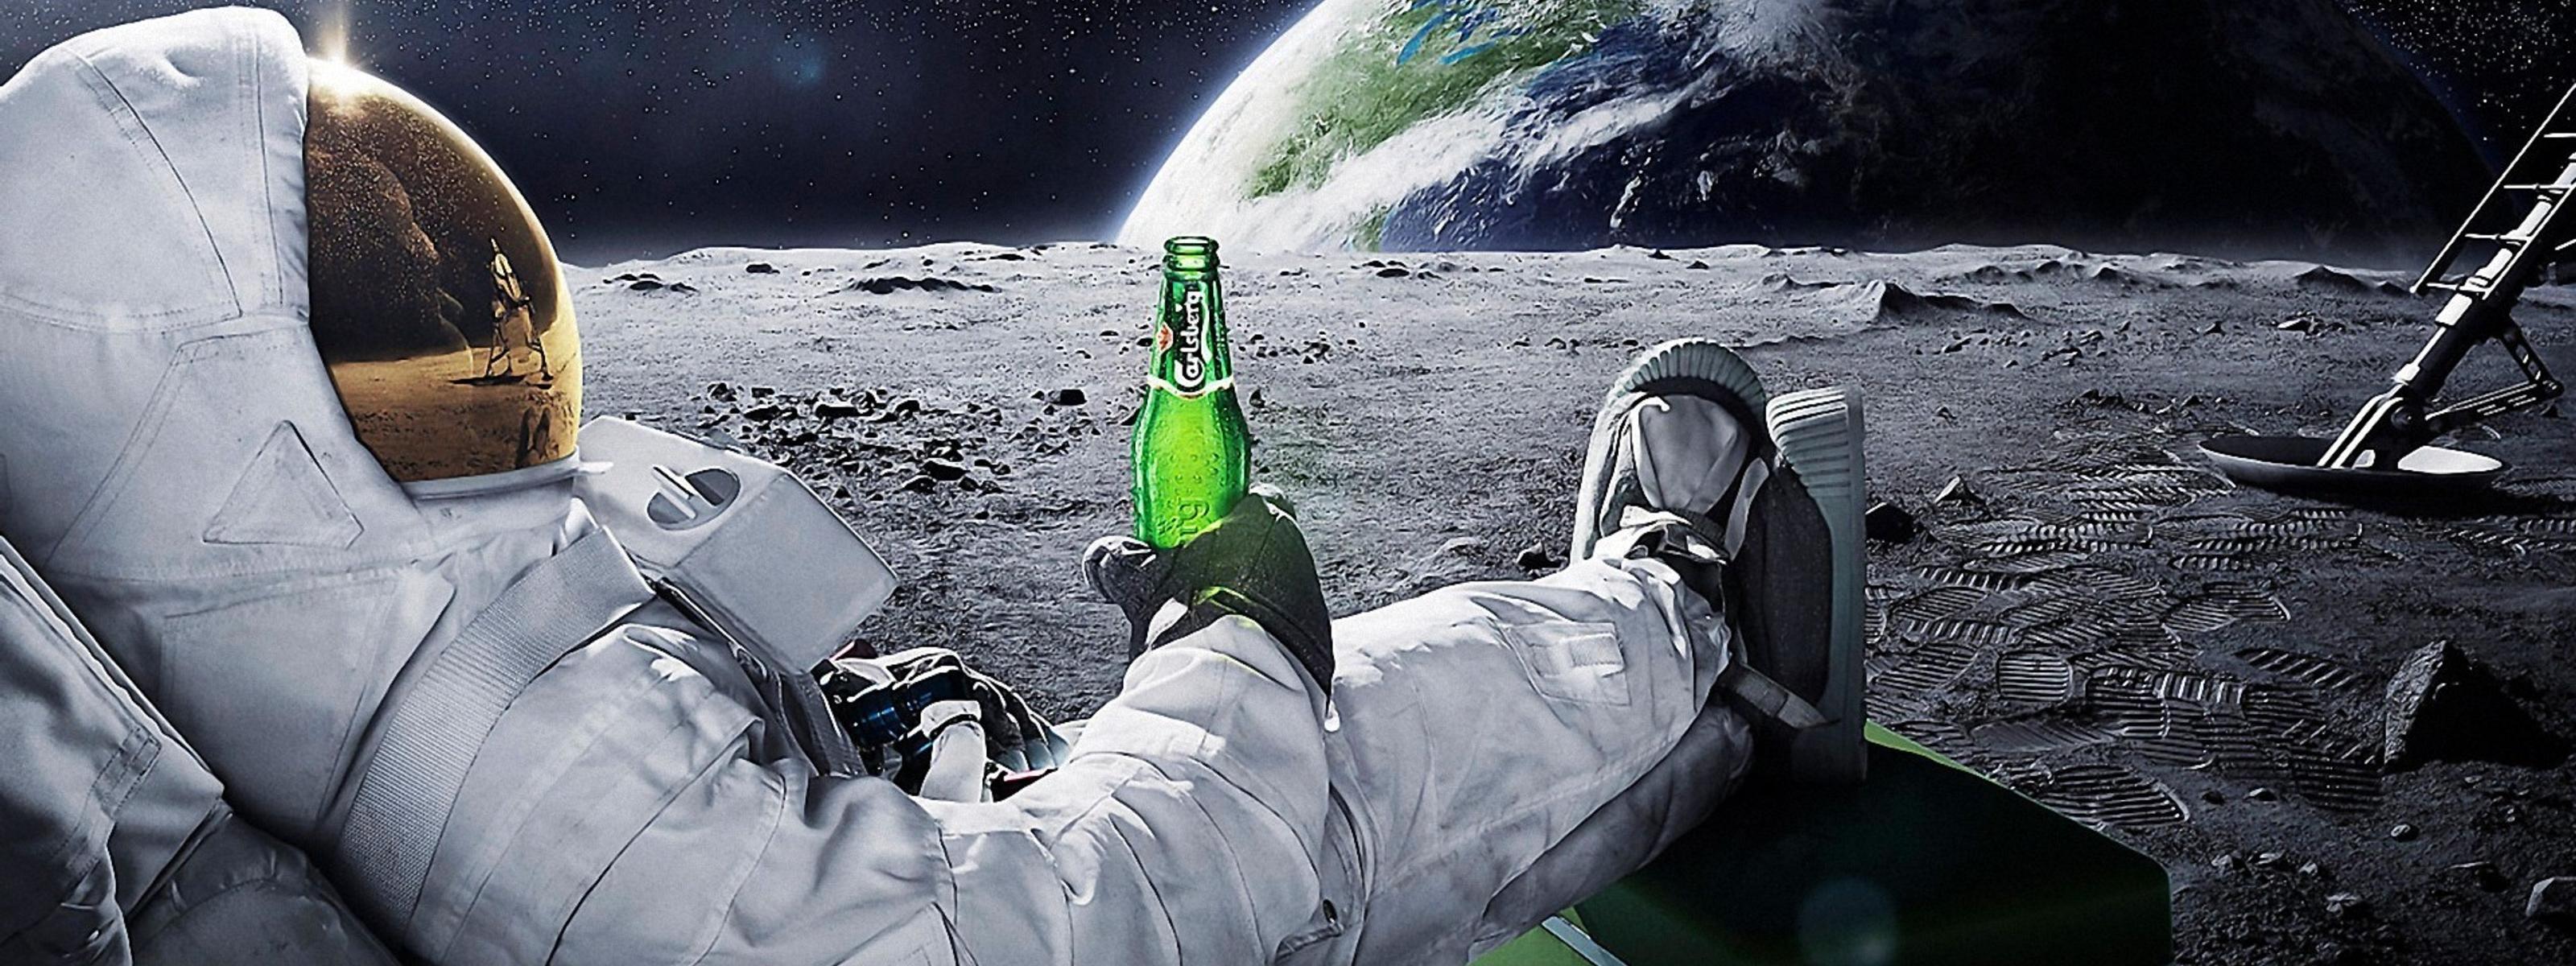 Download Wallpaper 3200x1200 A Men In Space With Carlsberg Beer